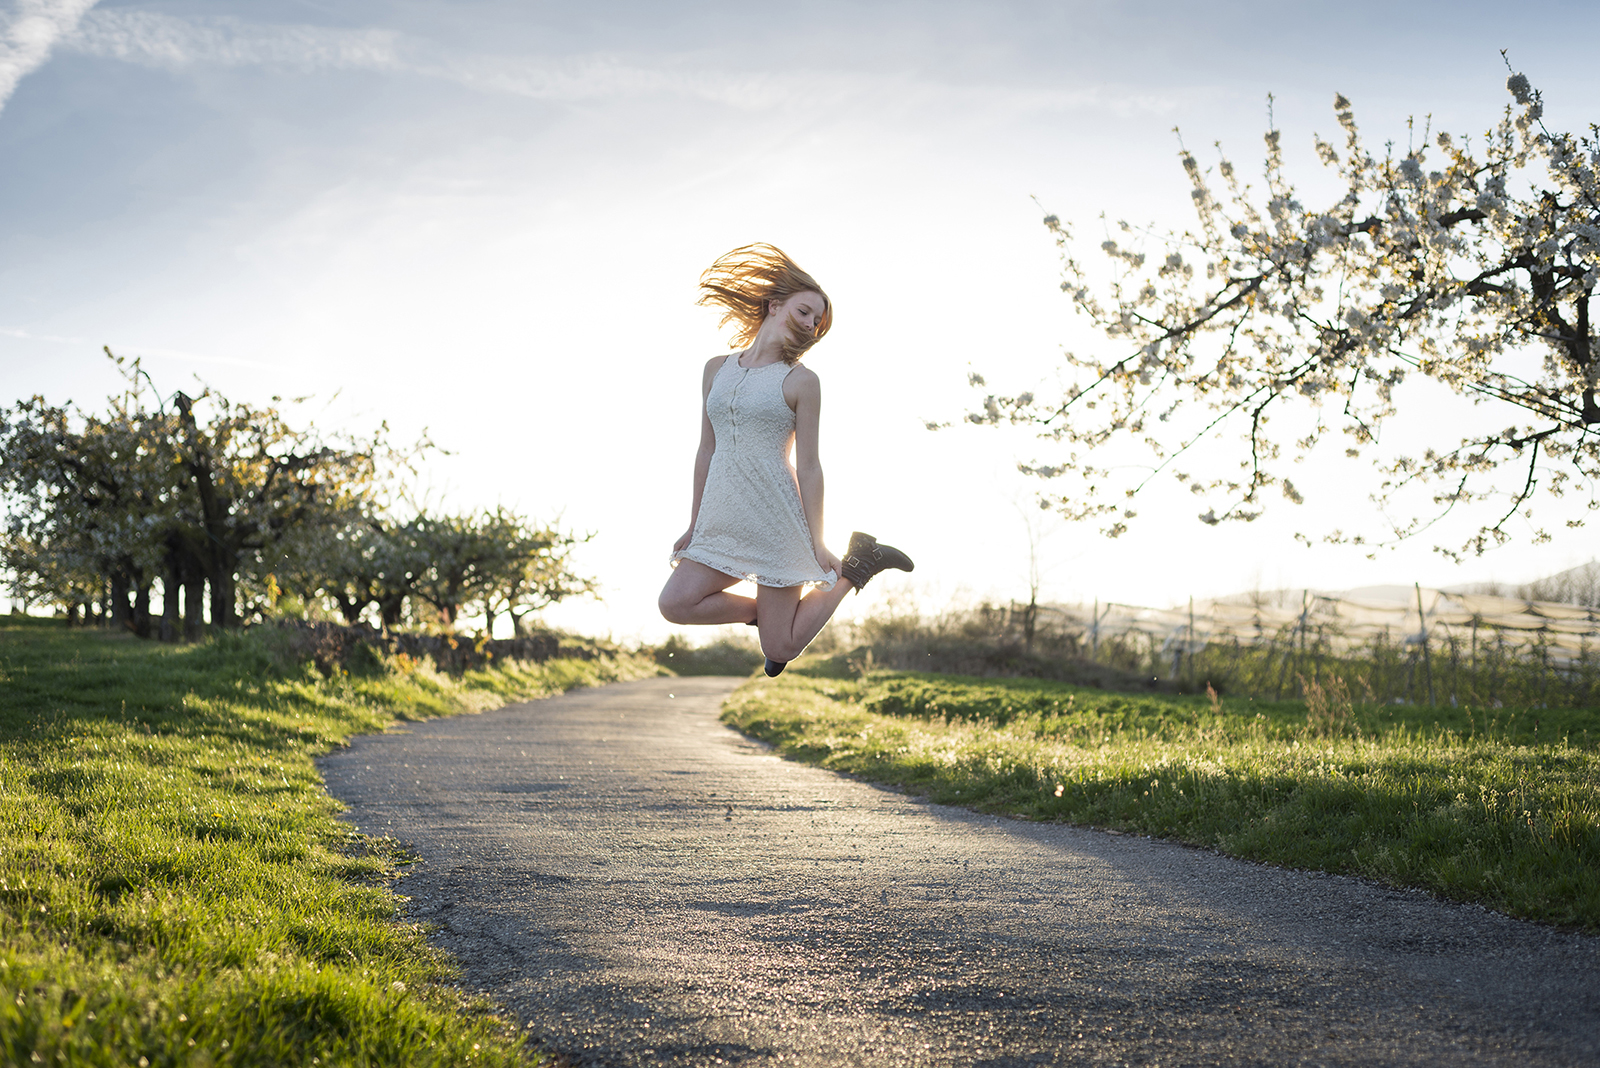 jeune fille qui saute